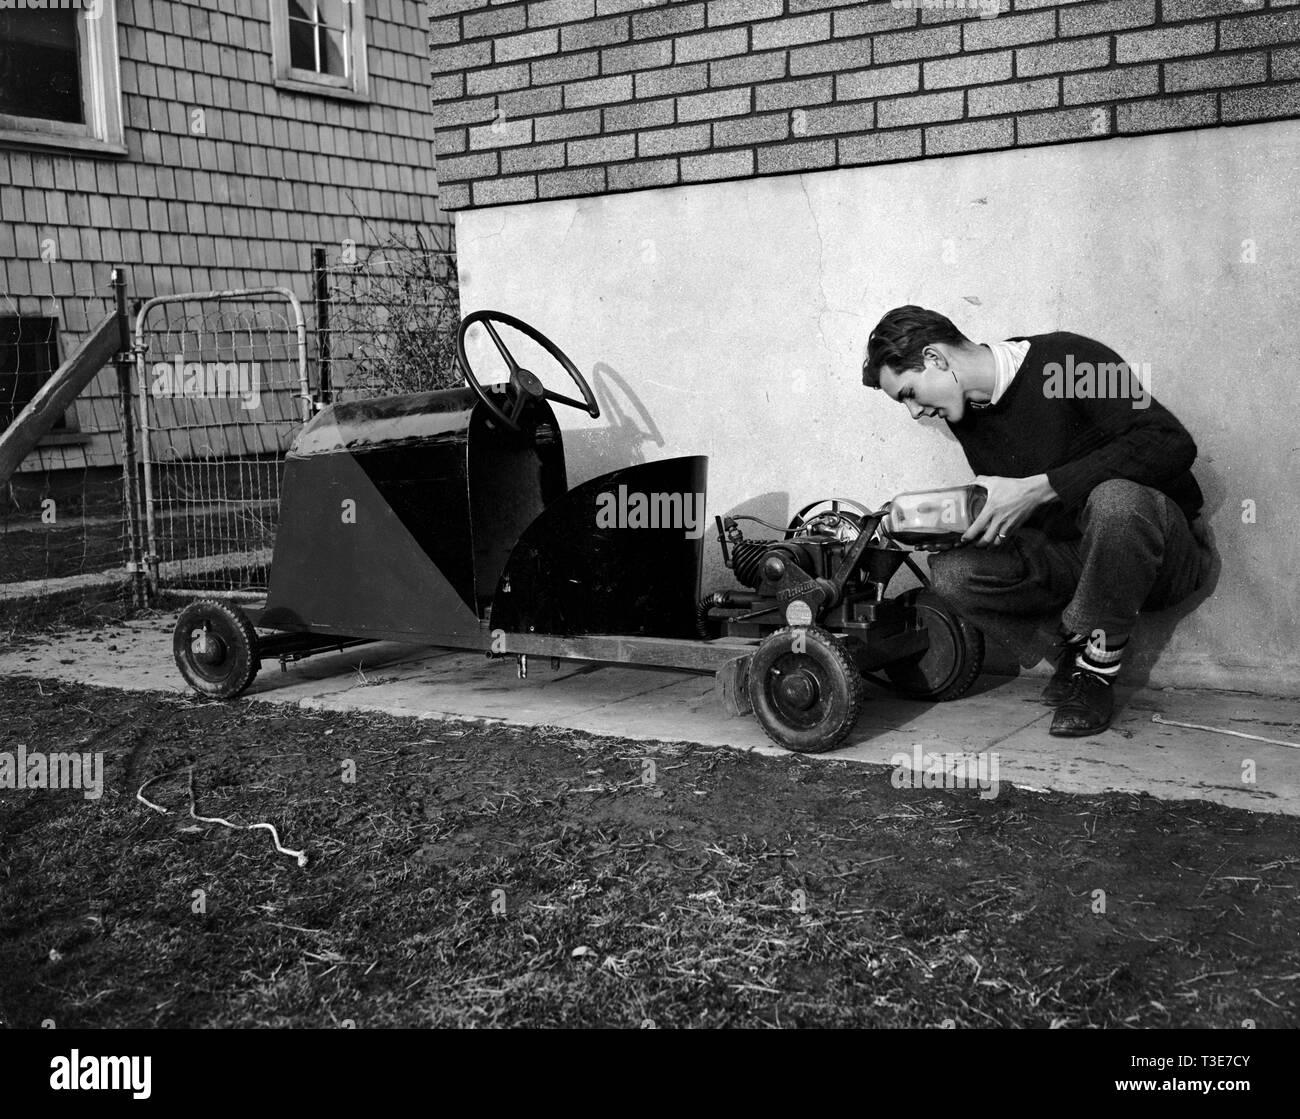 Boy Making Go Kart Stock Photos & Boy Making Go Kart Stock